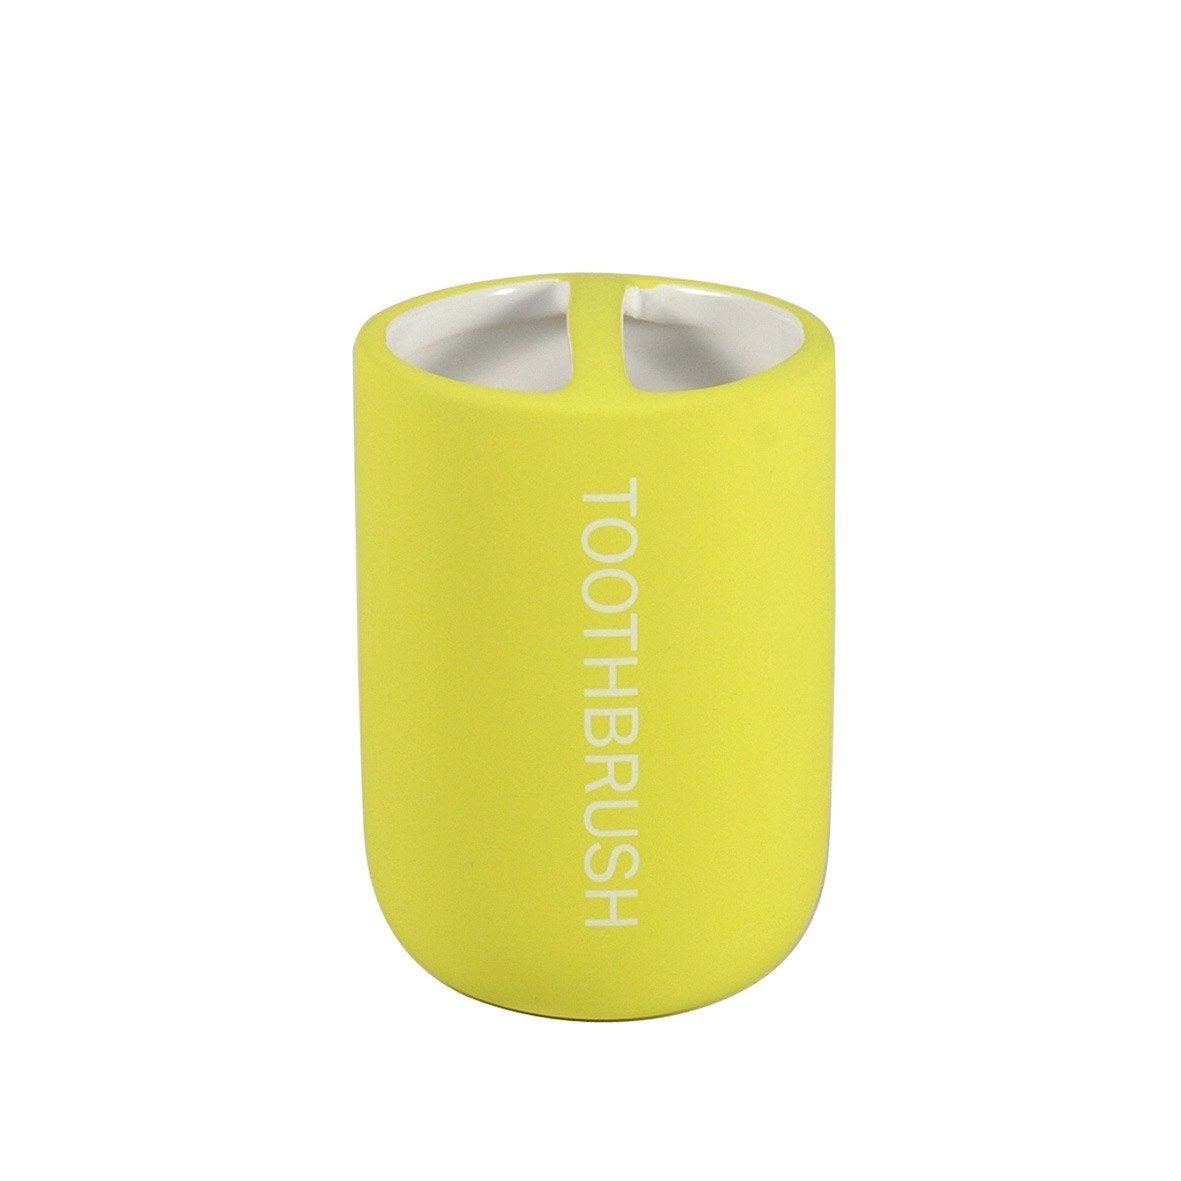 Porte brosse dents bubble gum jaune anis 5 leroy merlin - Brosse metallique leroy merlin ...